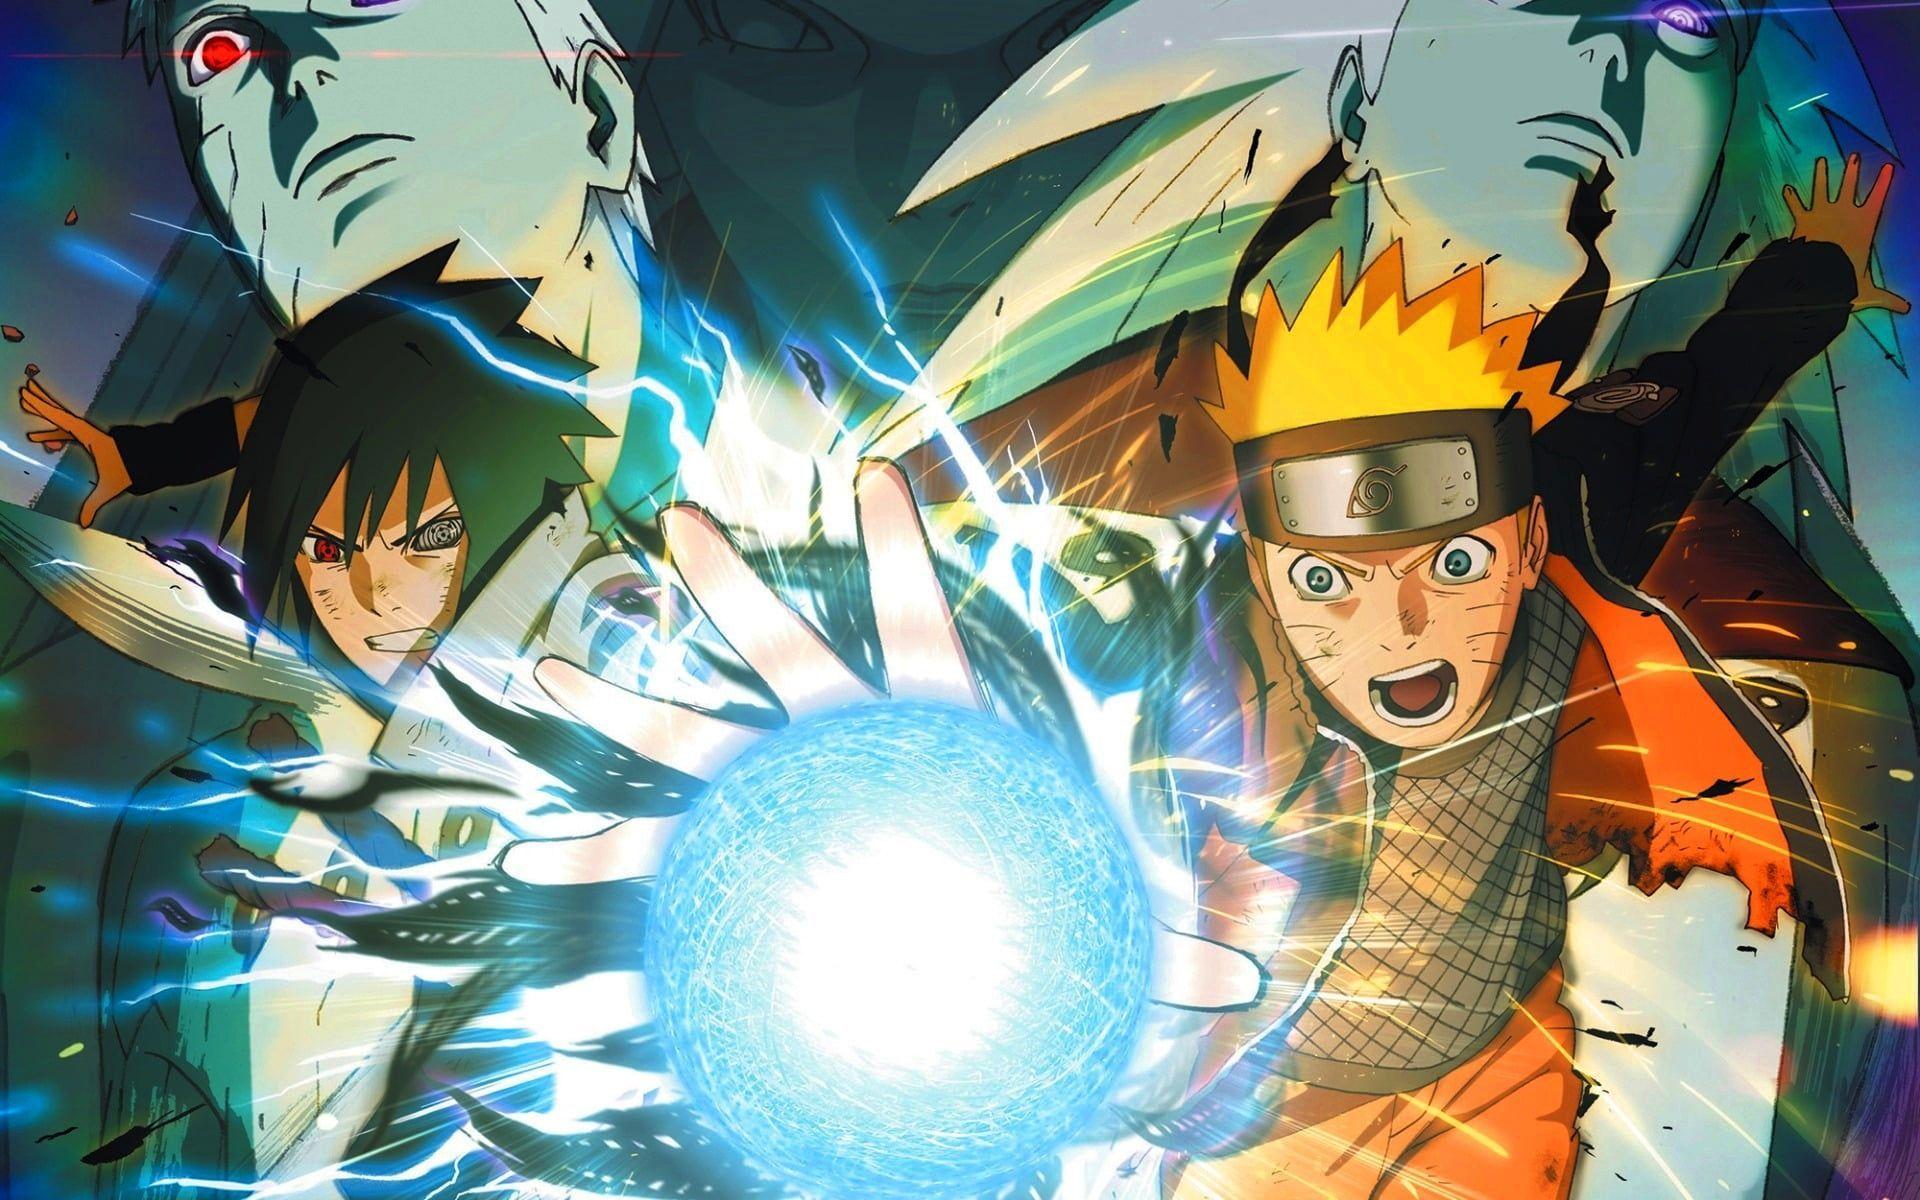 Naruto Shippuden Ultimate Ninja Stor, Naruto and Sasuke digital wallpaper  #Games # #2015 naruto shippuden ultimat… | Naruto vs sasuke, Anime, Naruto  vs sasuke final